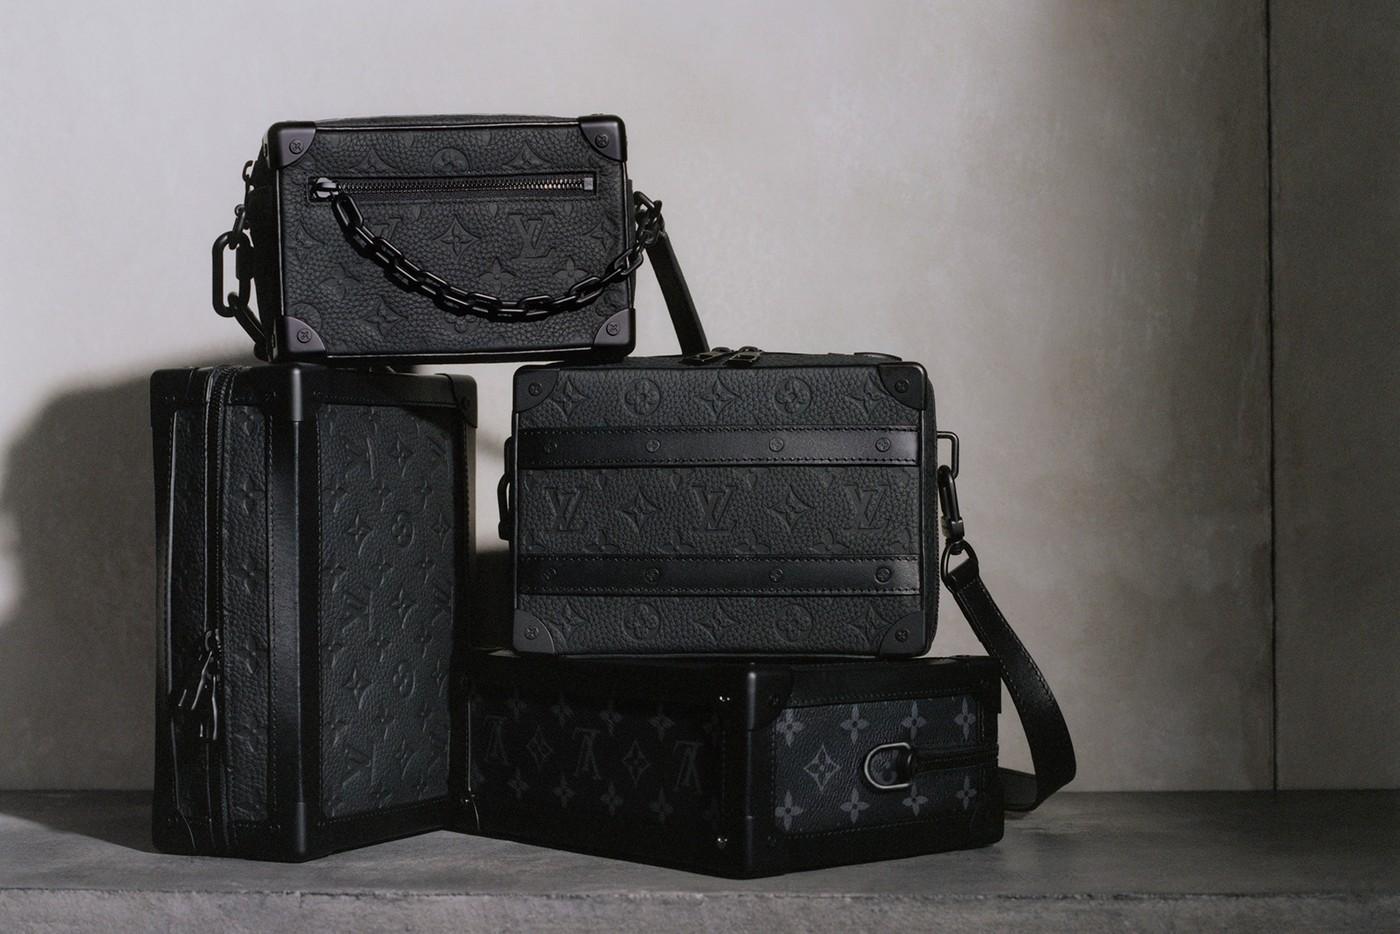 Louis Vuitton обновил классические модели сумок Christopher и Soft Trunk (фото 6)